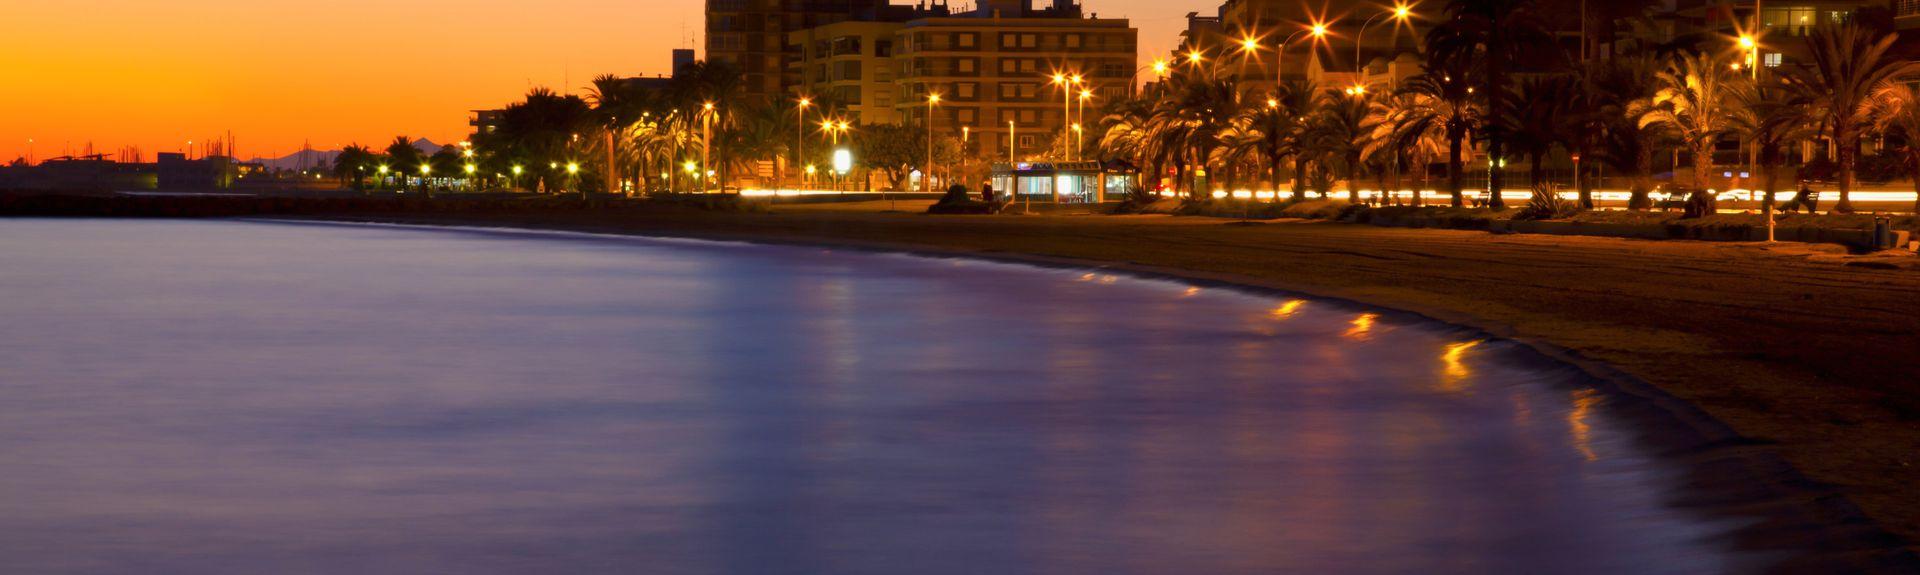 Santa Pola, Valence, Espagne